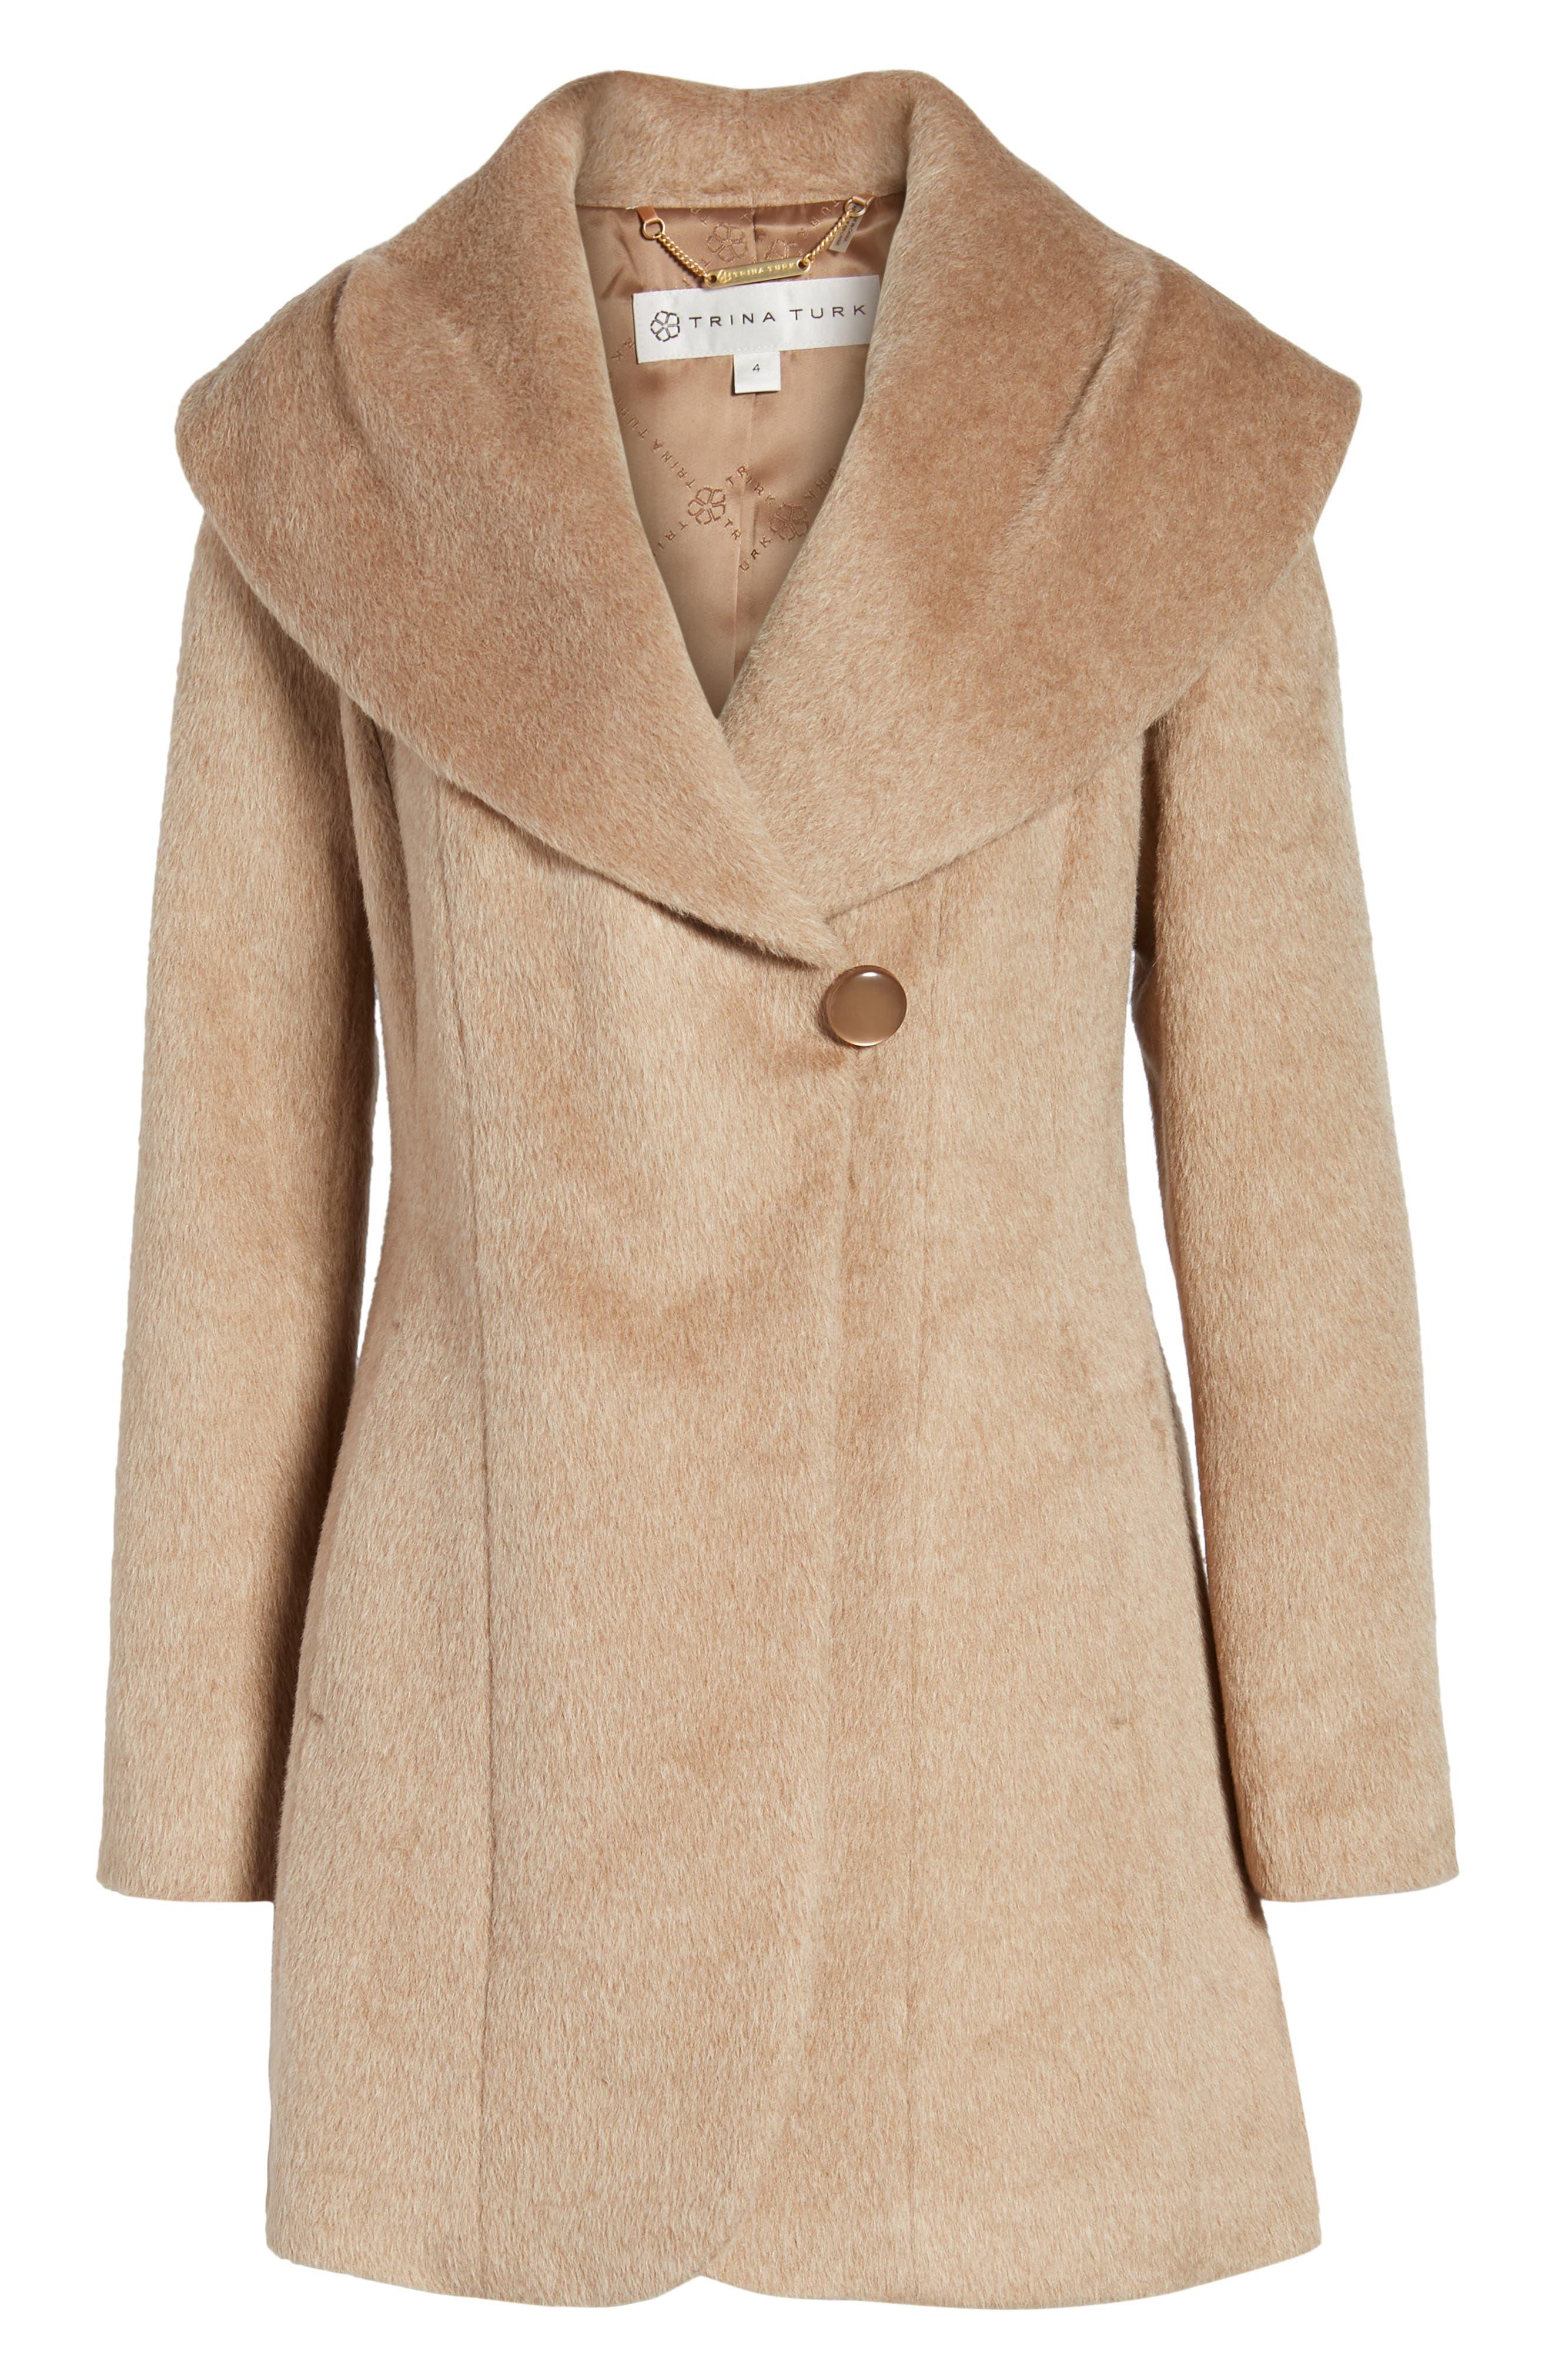 Jemma Shawl Collar Coat,                             Alternate thumbnail 5, color,                             255